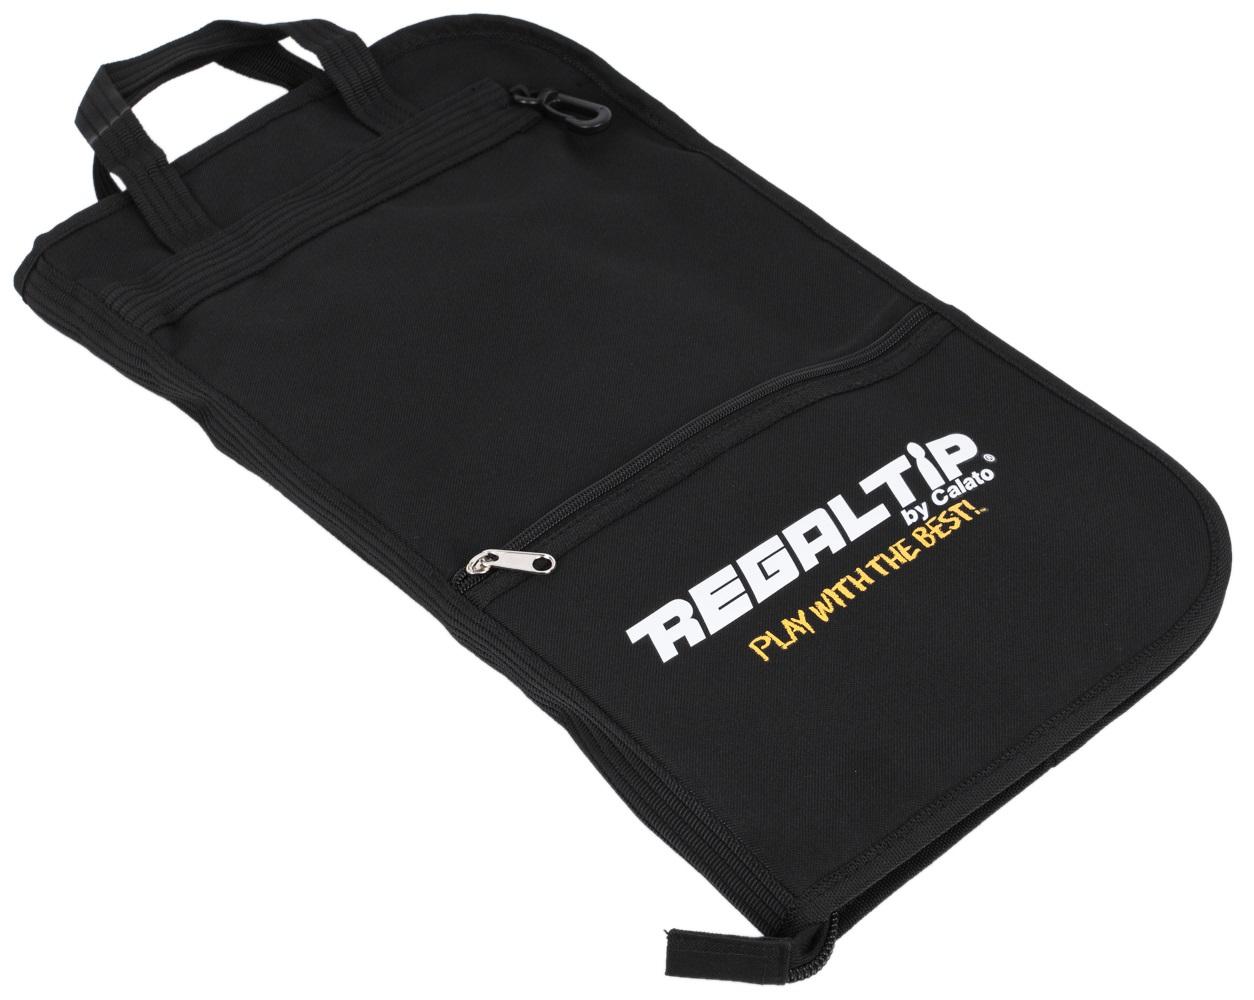 Regal Tip PR-380A